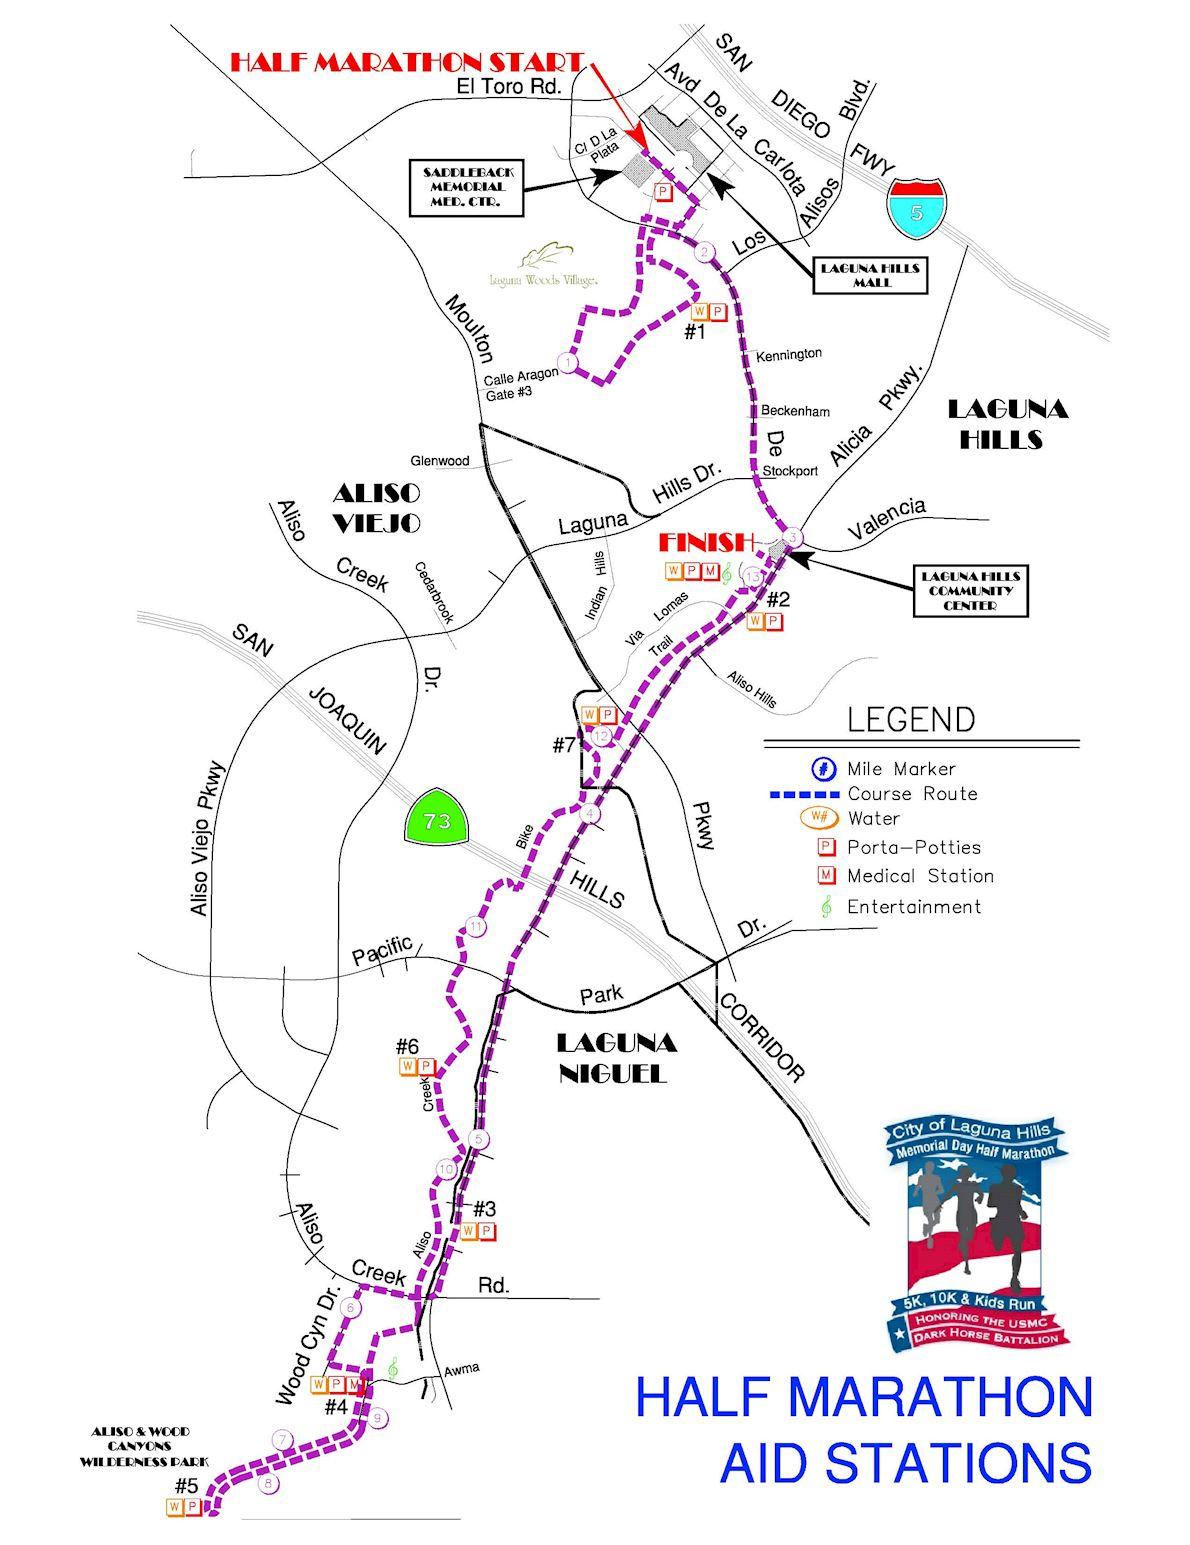 City of Laguna Hills Memorial Half Marathon 路线图